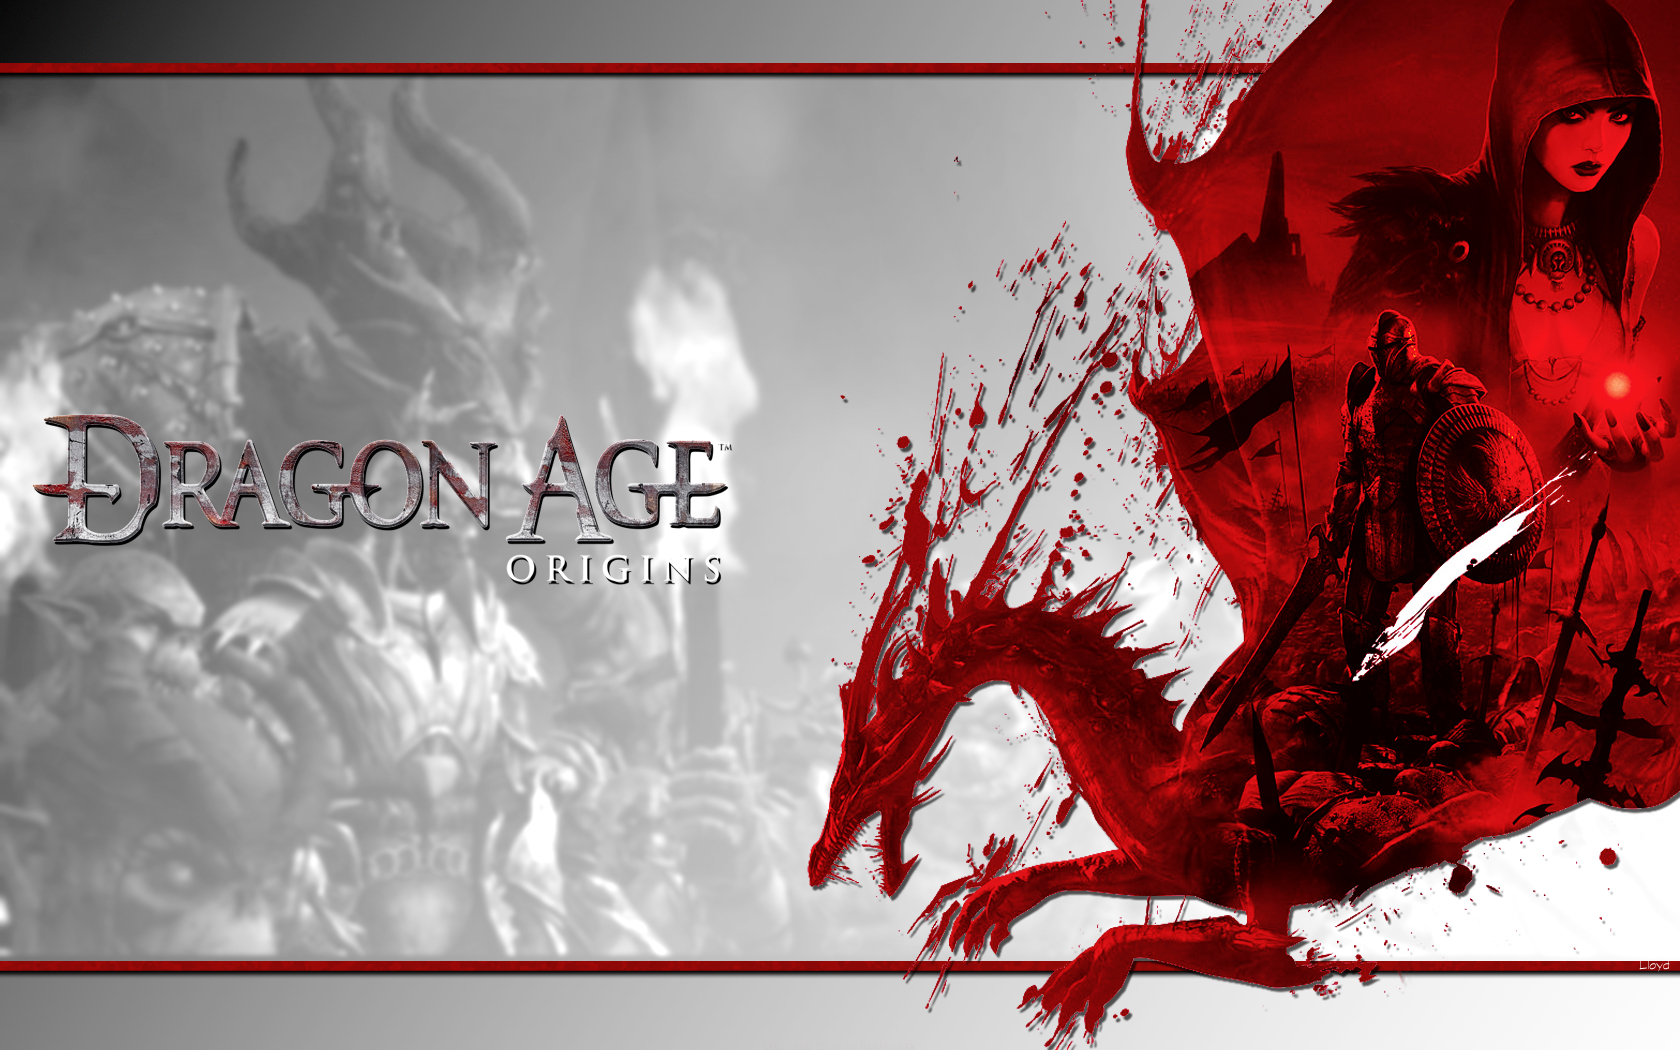 Dragon Age Origins Wallpapers: Dragon Age: Origins Wp By Igotgame1075 On DeviantArt